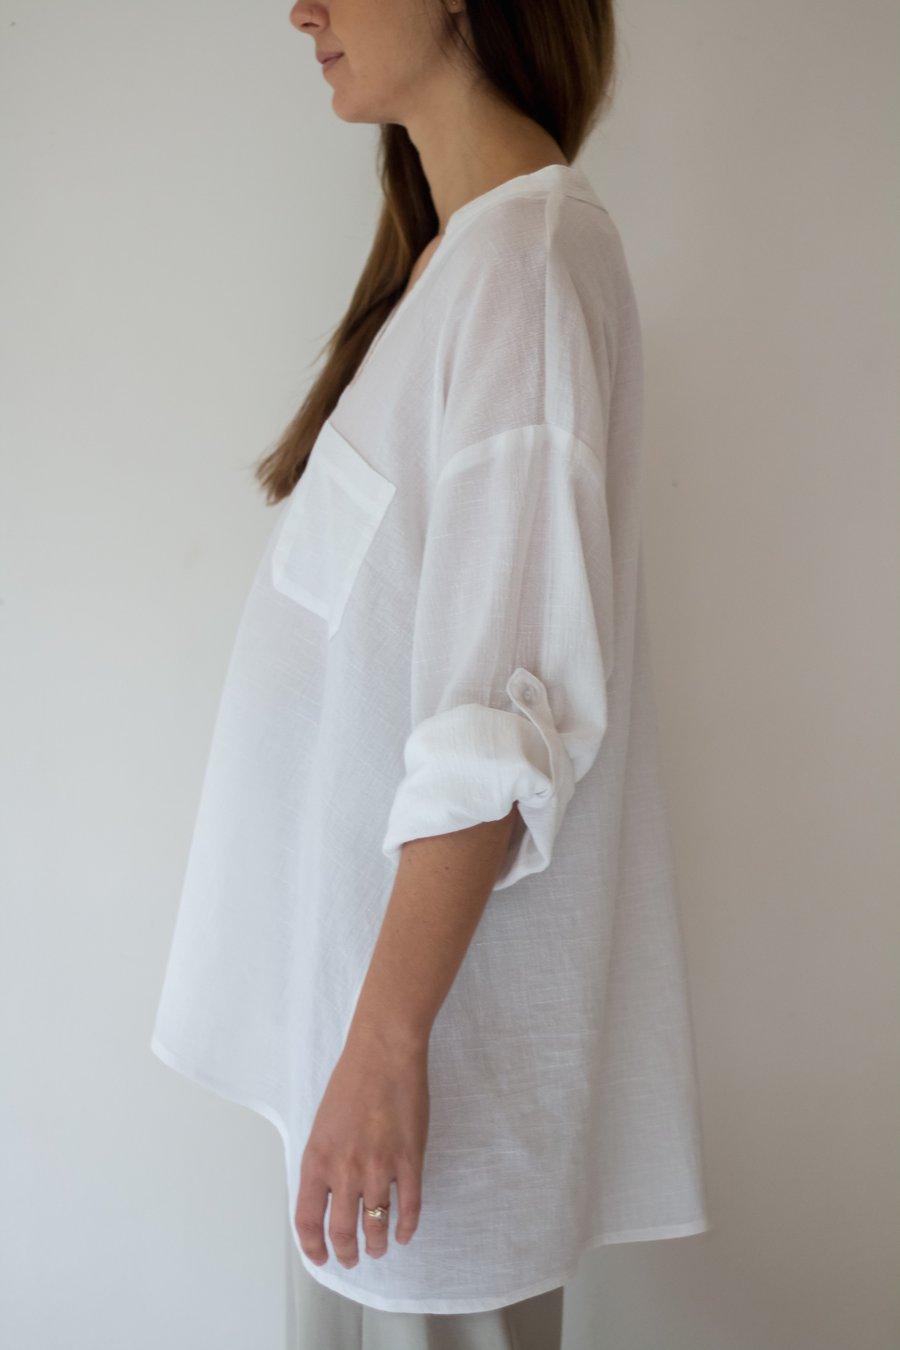 Image of Loose Light Shirt